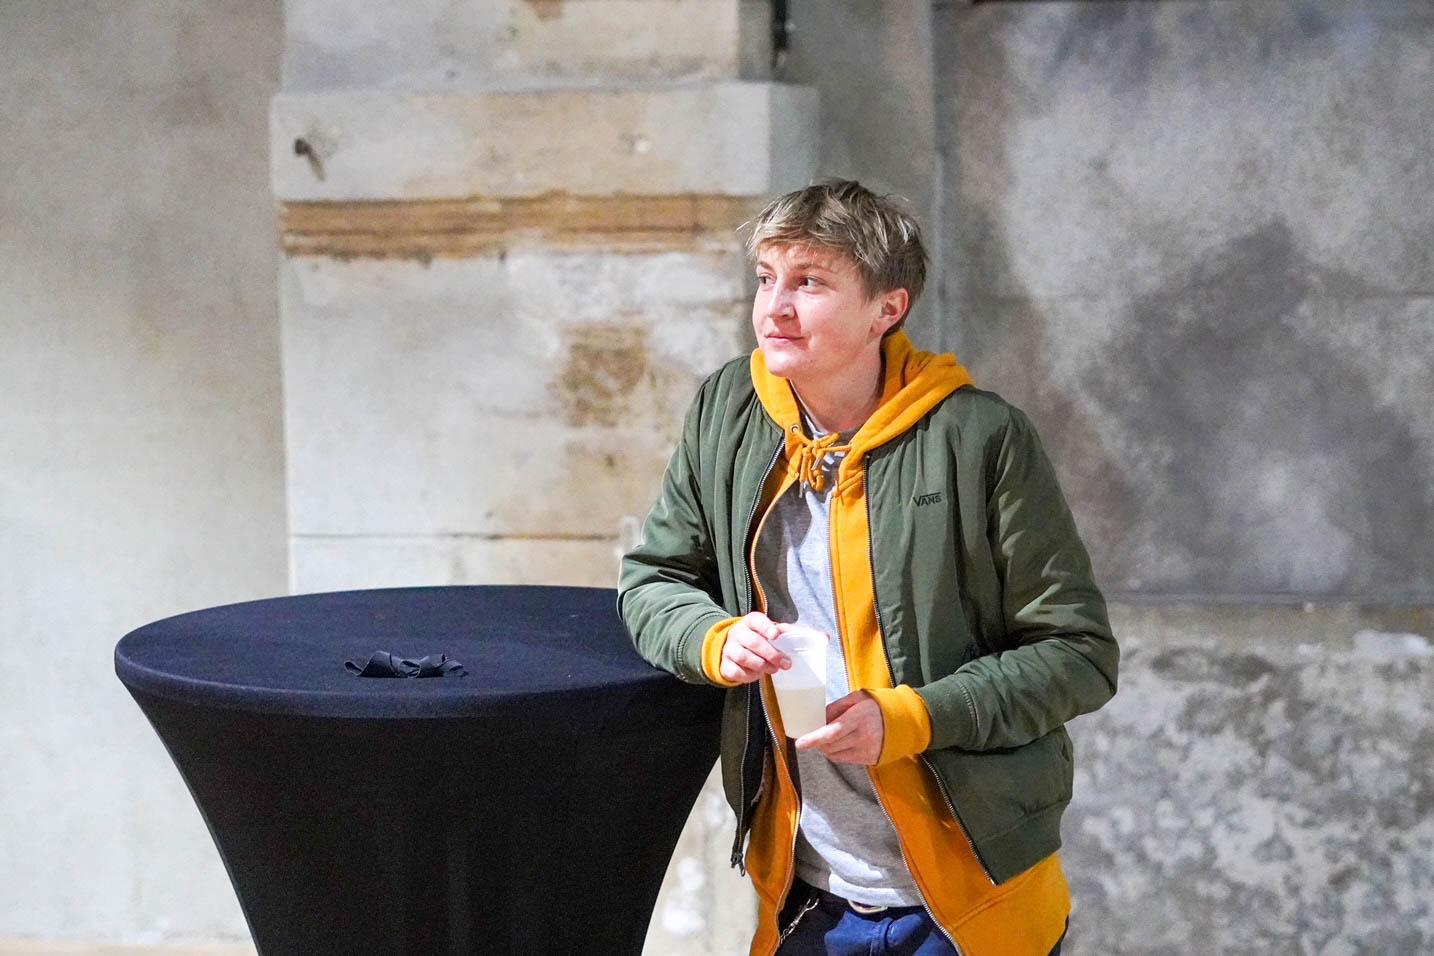 Solo-Show-vernissage-PK-at-Kunstkraftwerk-Leipzig-Germany-2020-photo-by-Tom-Gallmann-1